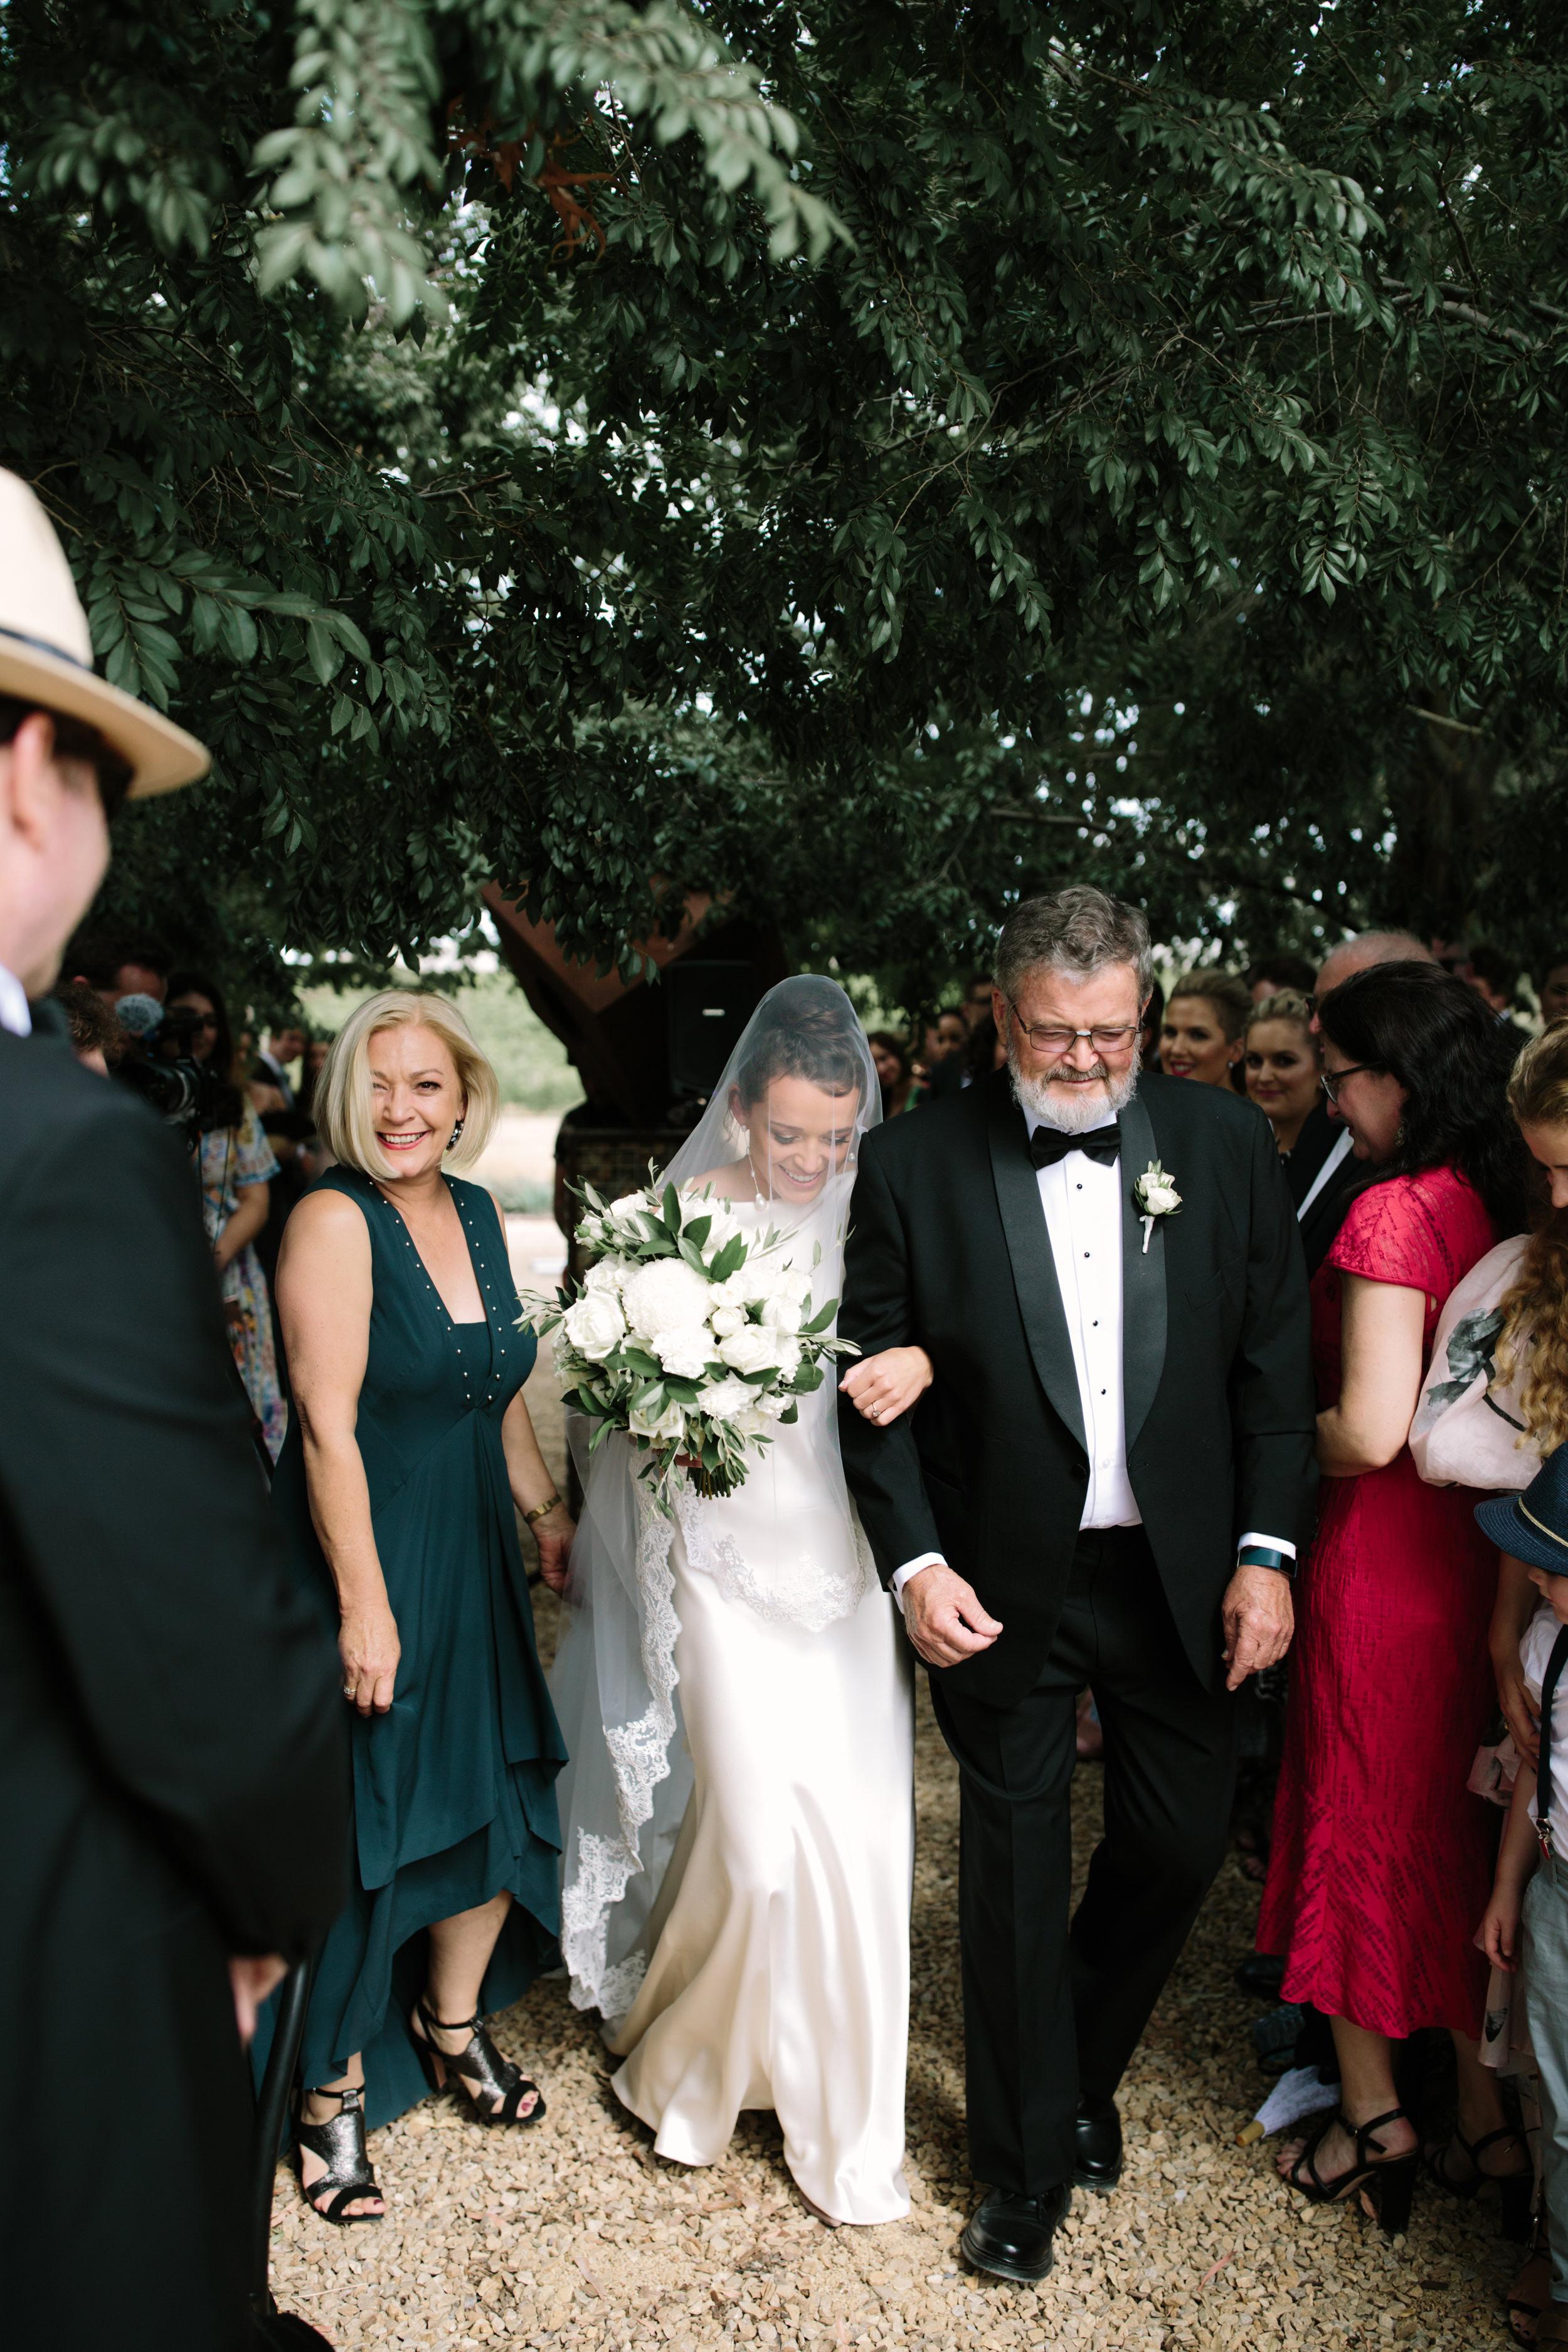 I-Got-You-Babe-Weddings-Vic-Siggy-Barossa-Valley0079.JPG